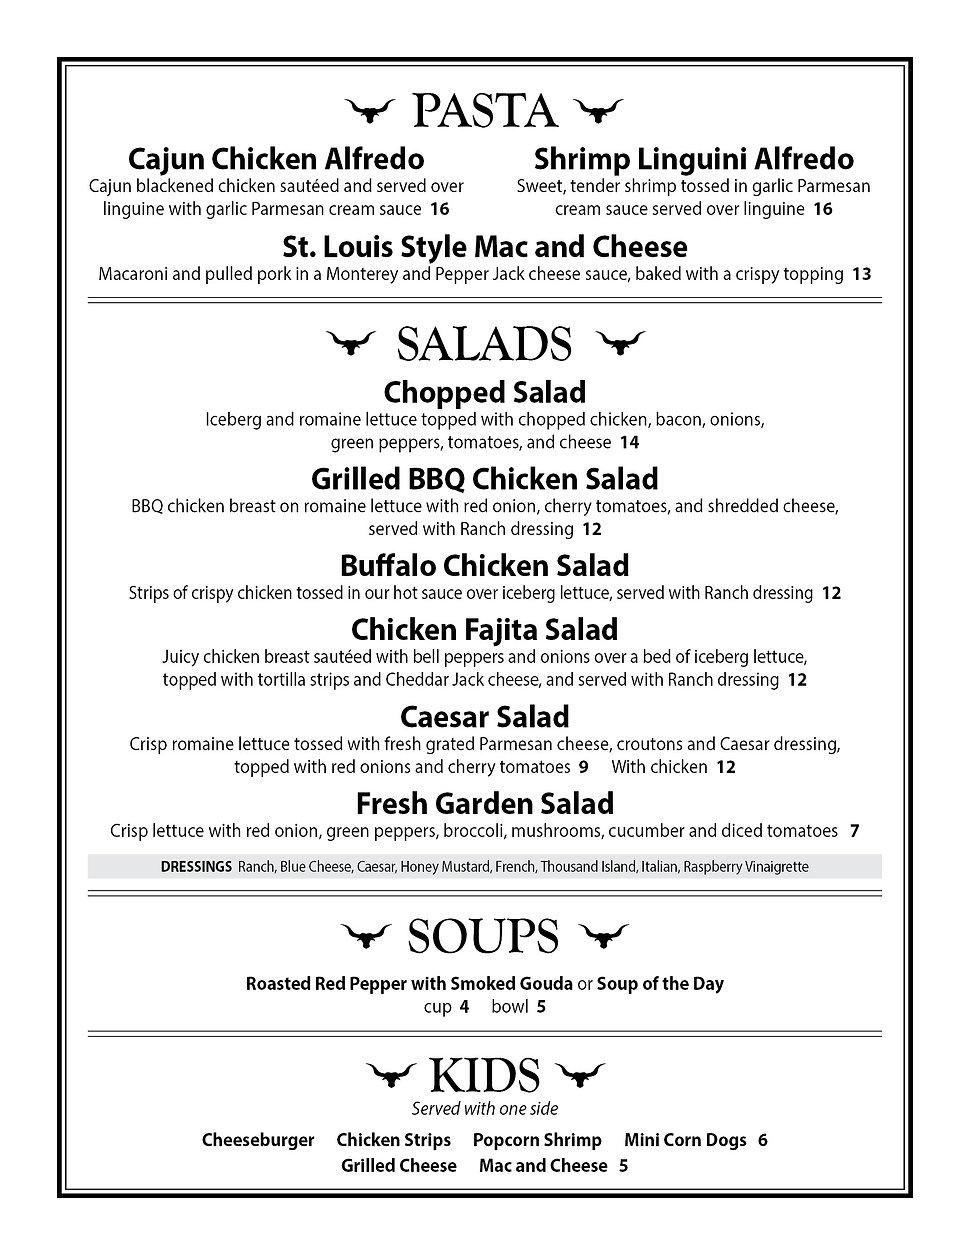 Pasts Salads Soup & Kids.jpg